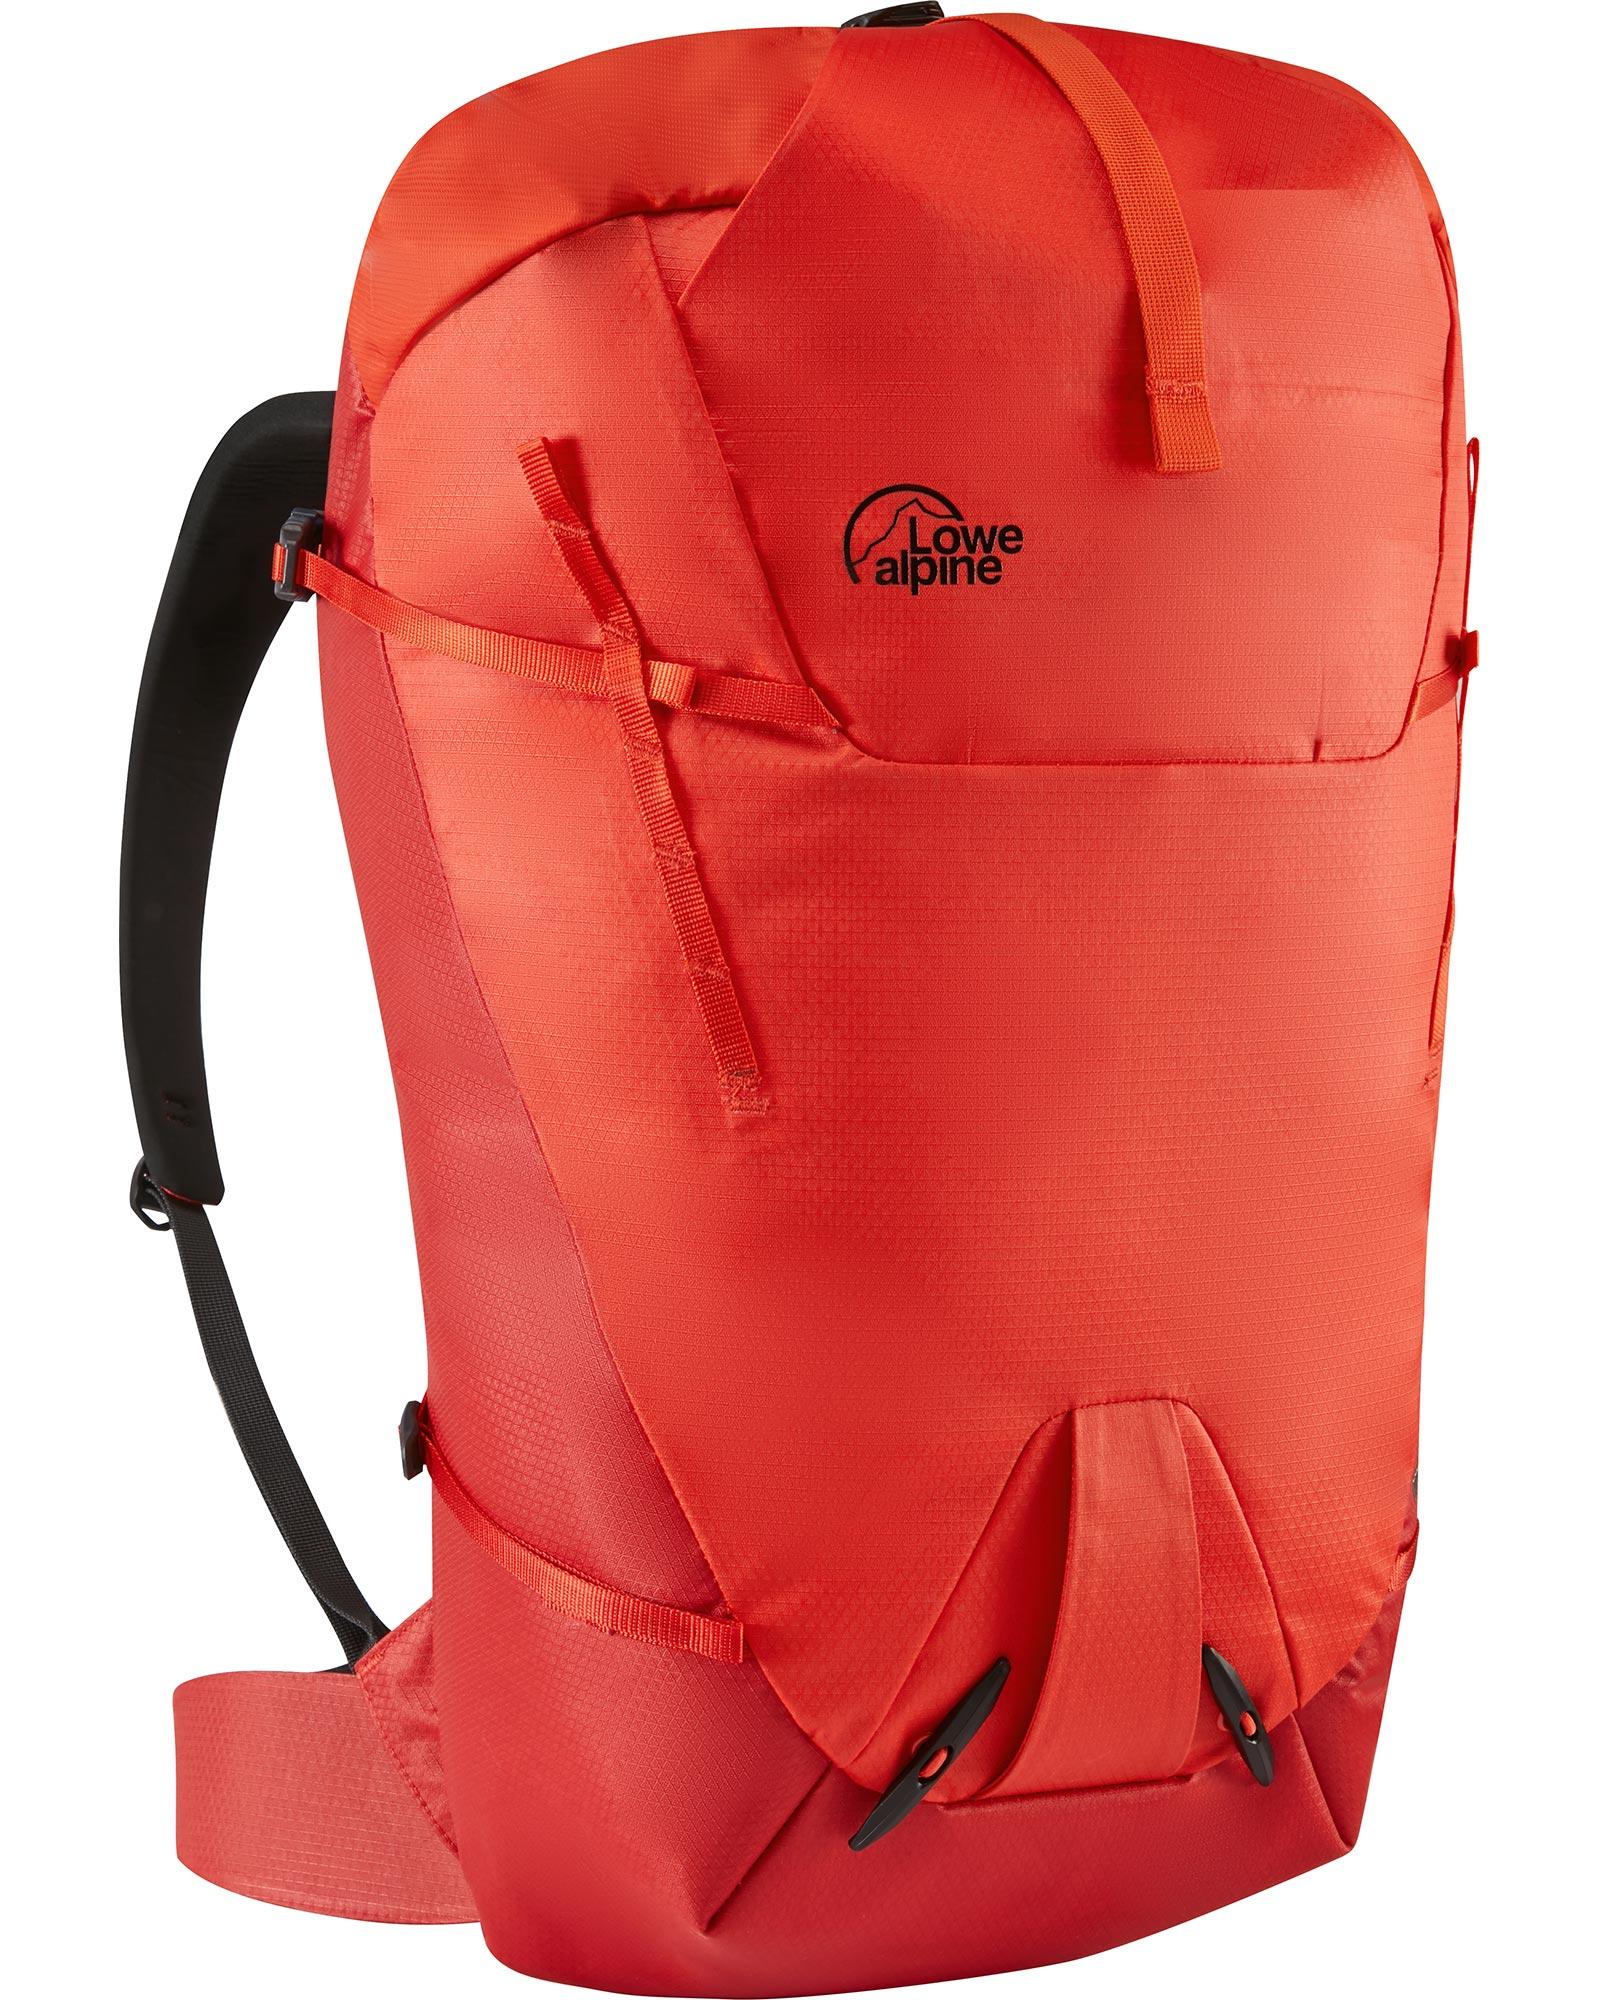 Lowe Alpine Uprise 30:40 Backpack 0